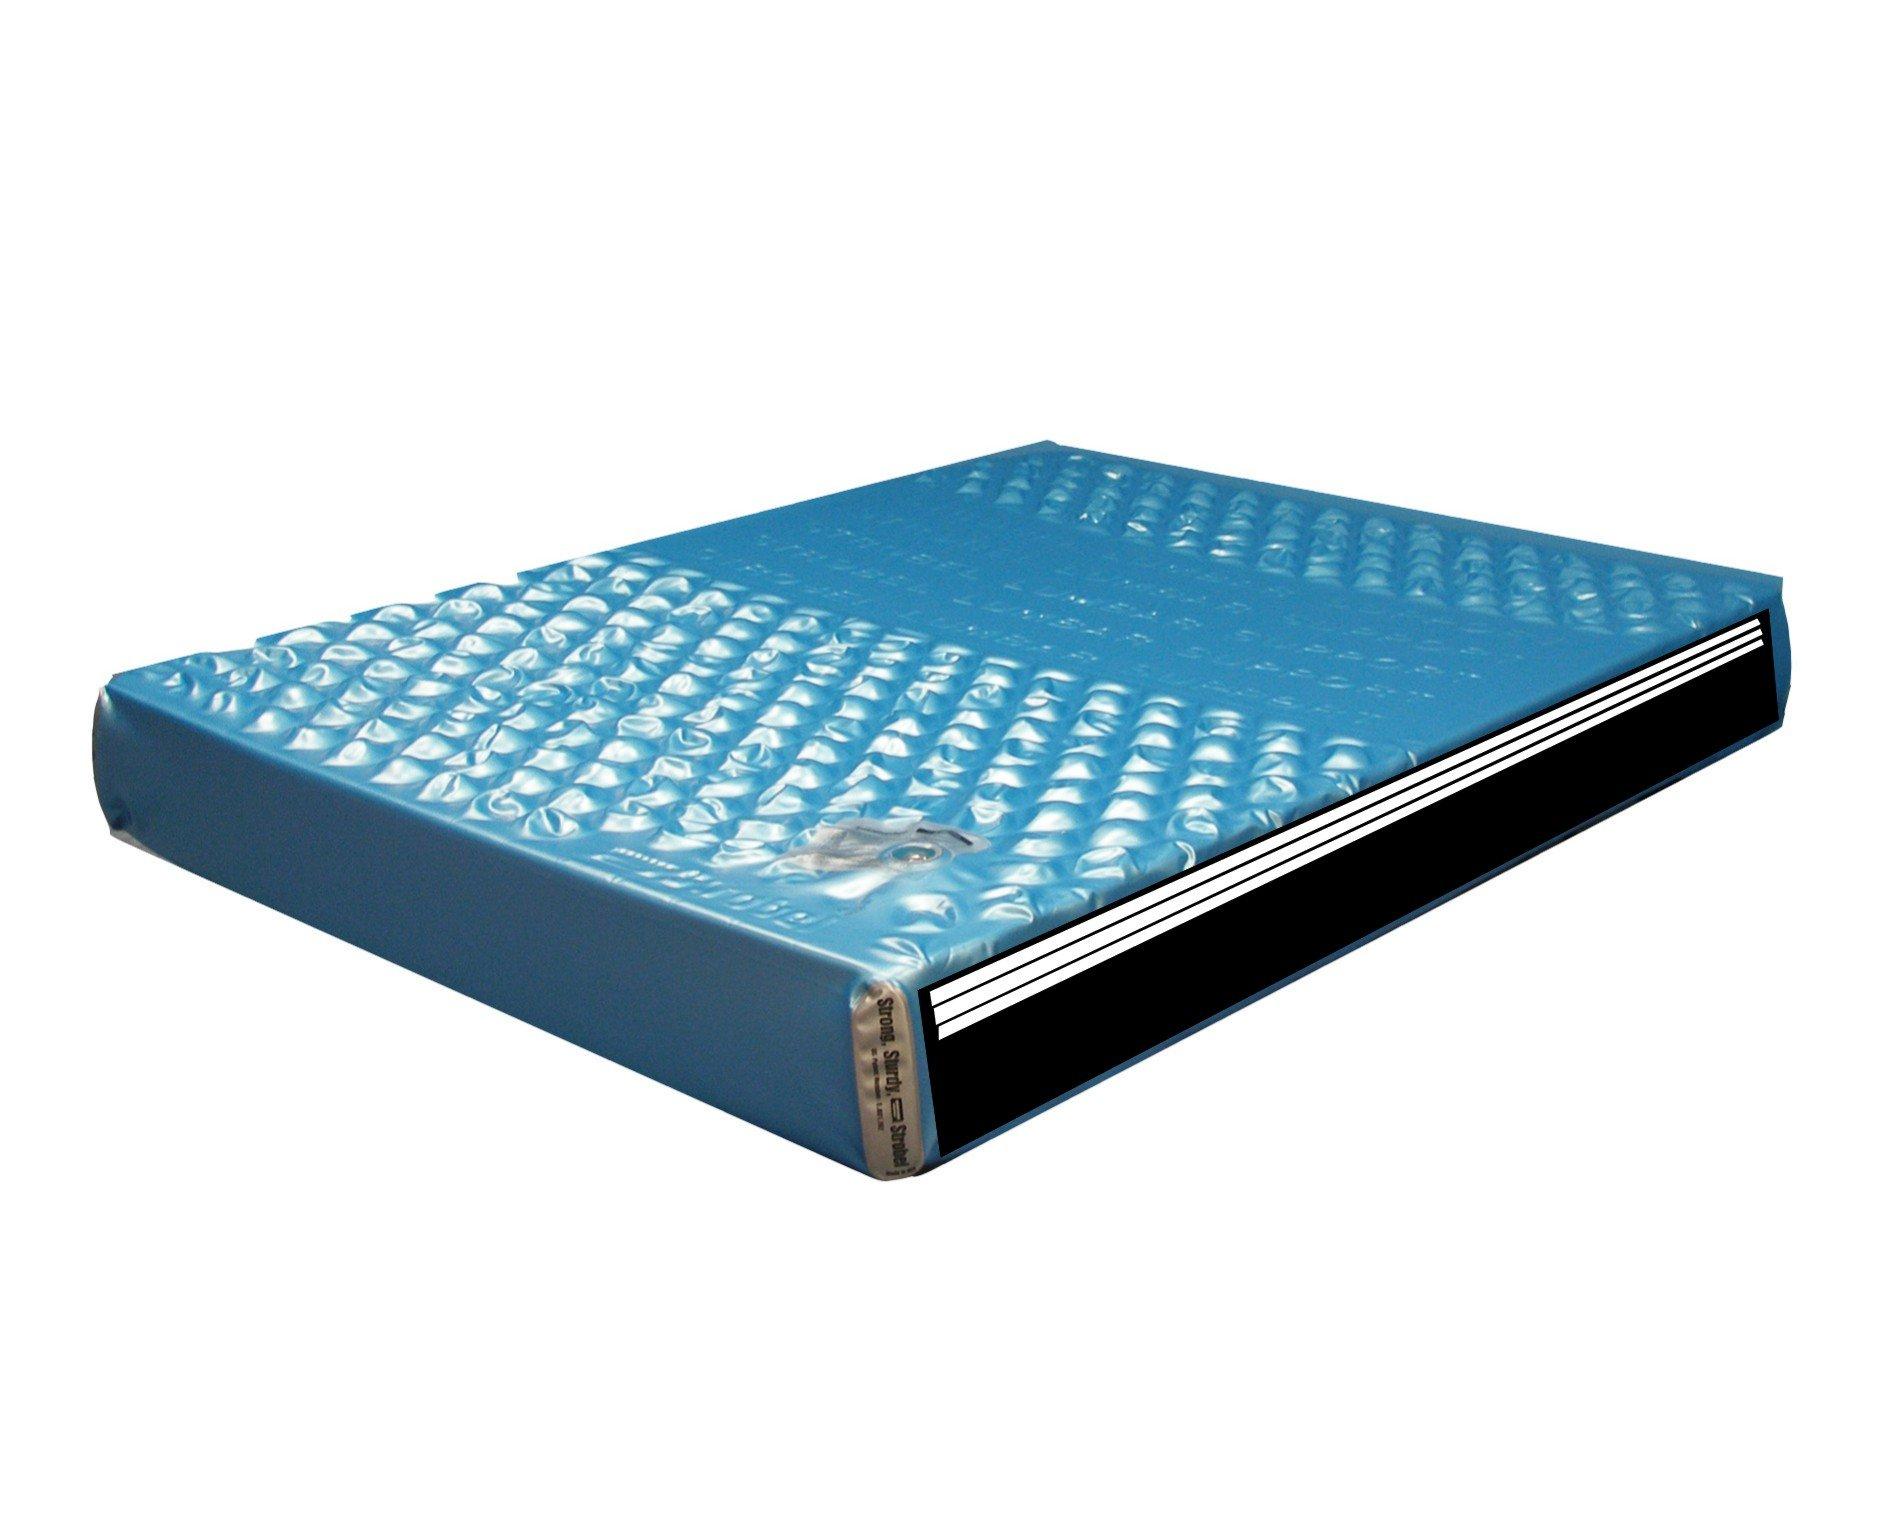 Strobel Organic Premium Hydro-Support 303 Waterbed Mattress 3 Layer Waveless King